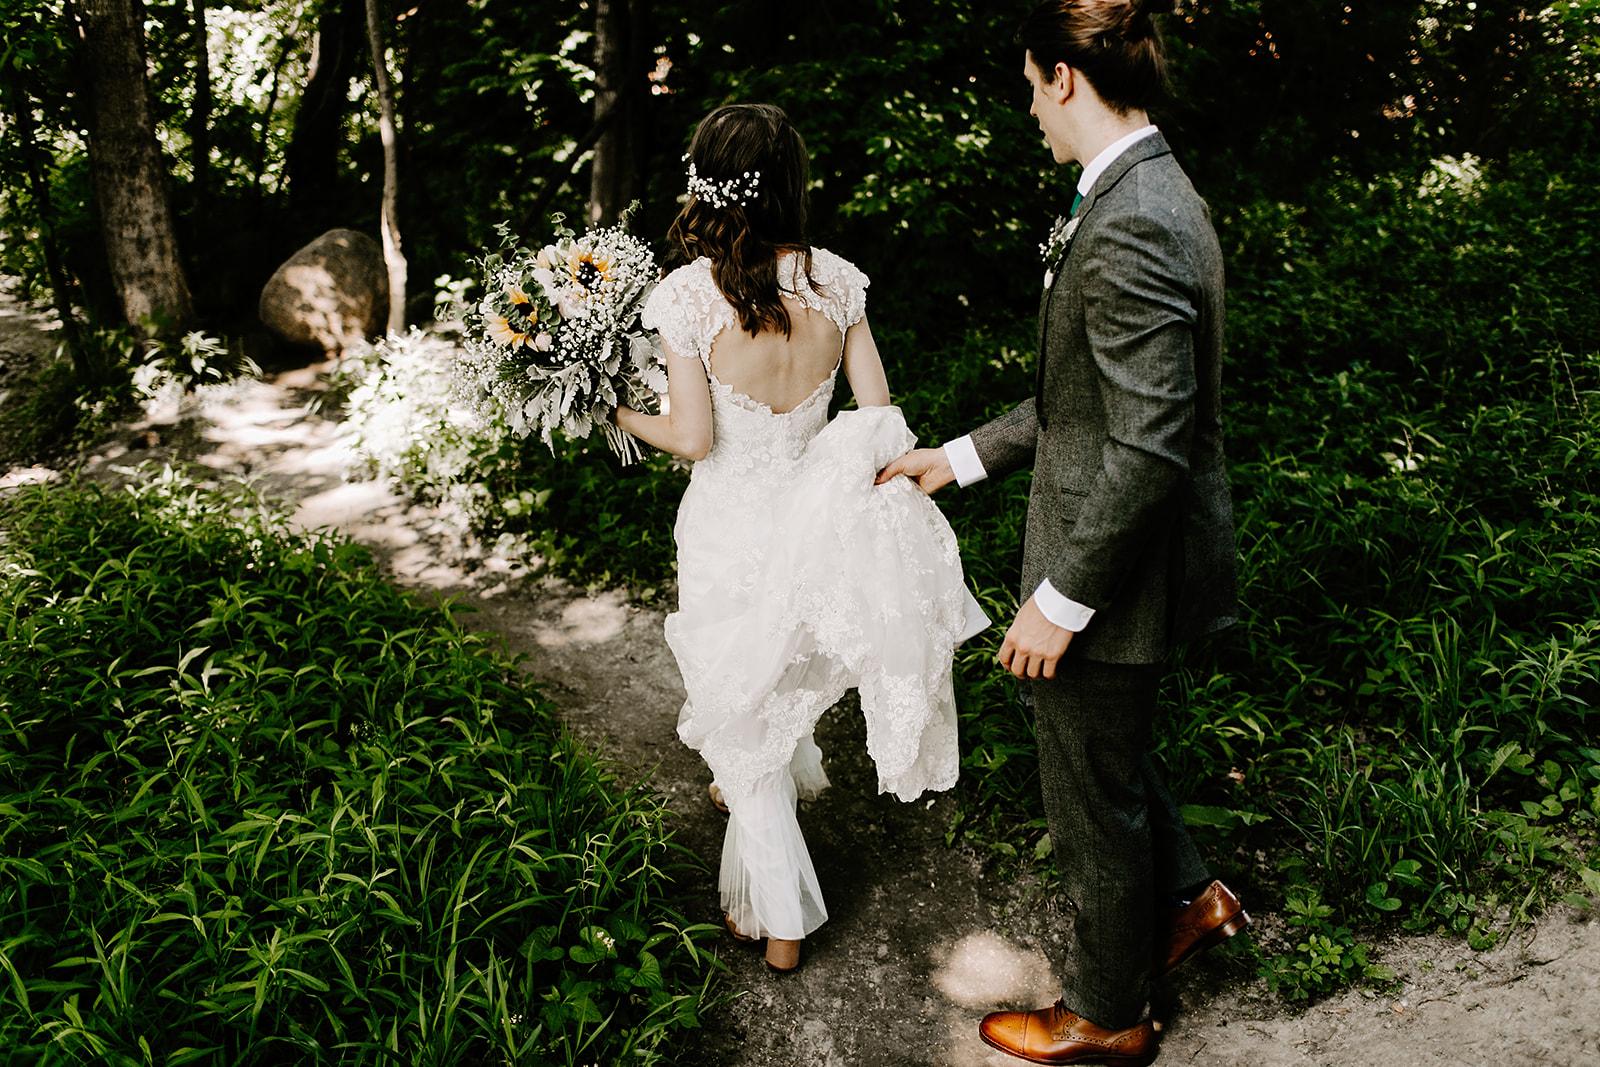 Lily and Easton Wedding Carmel Indiana Cool Creek Park Grace Church Emily Elyse Wehner Photography -132.jpg